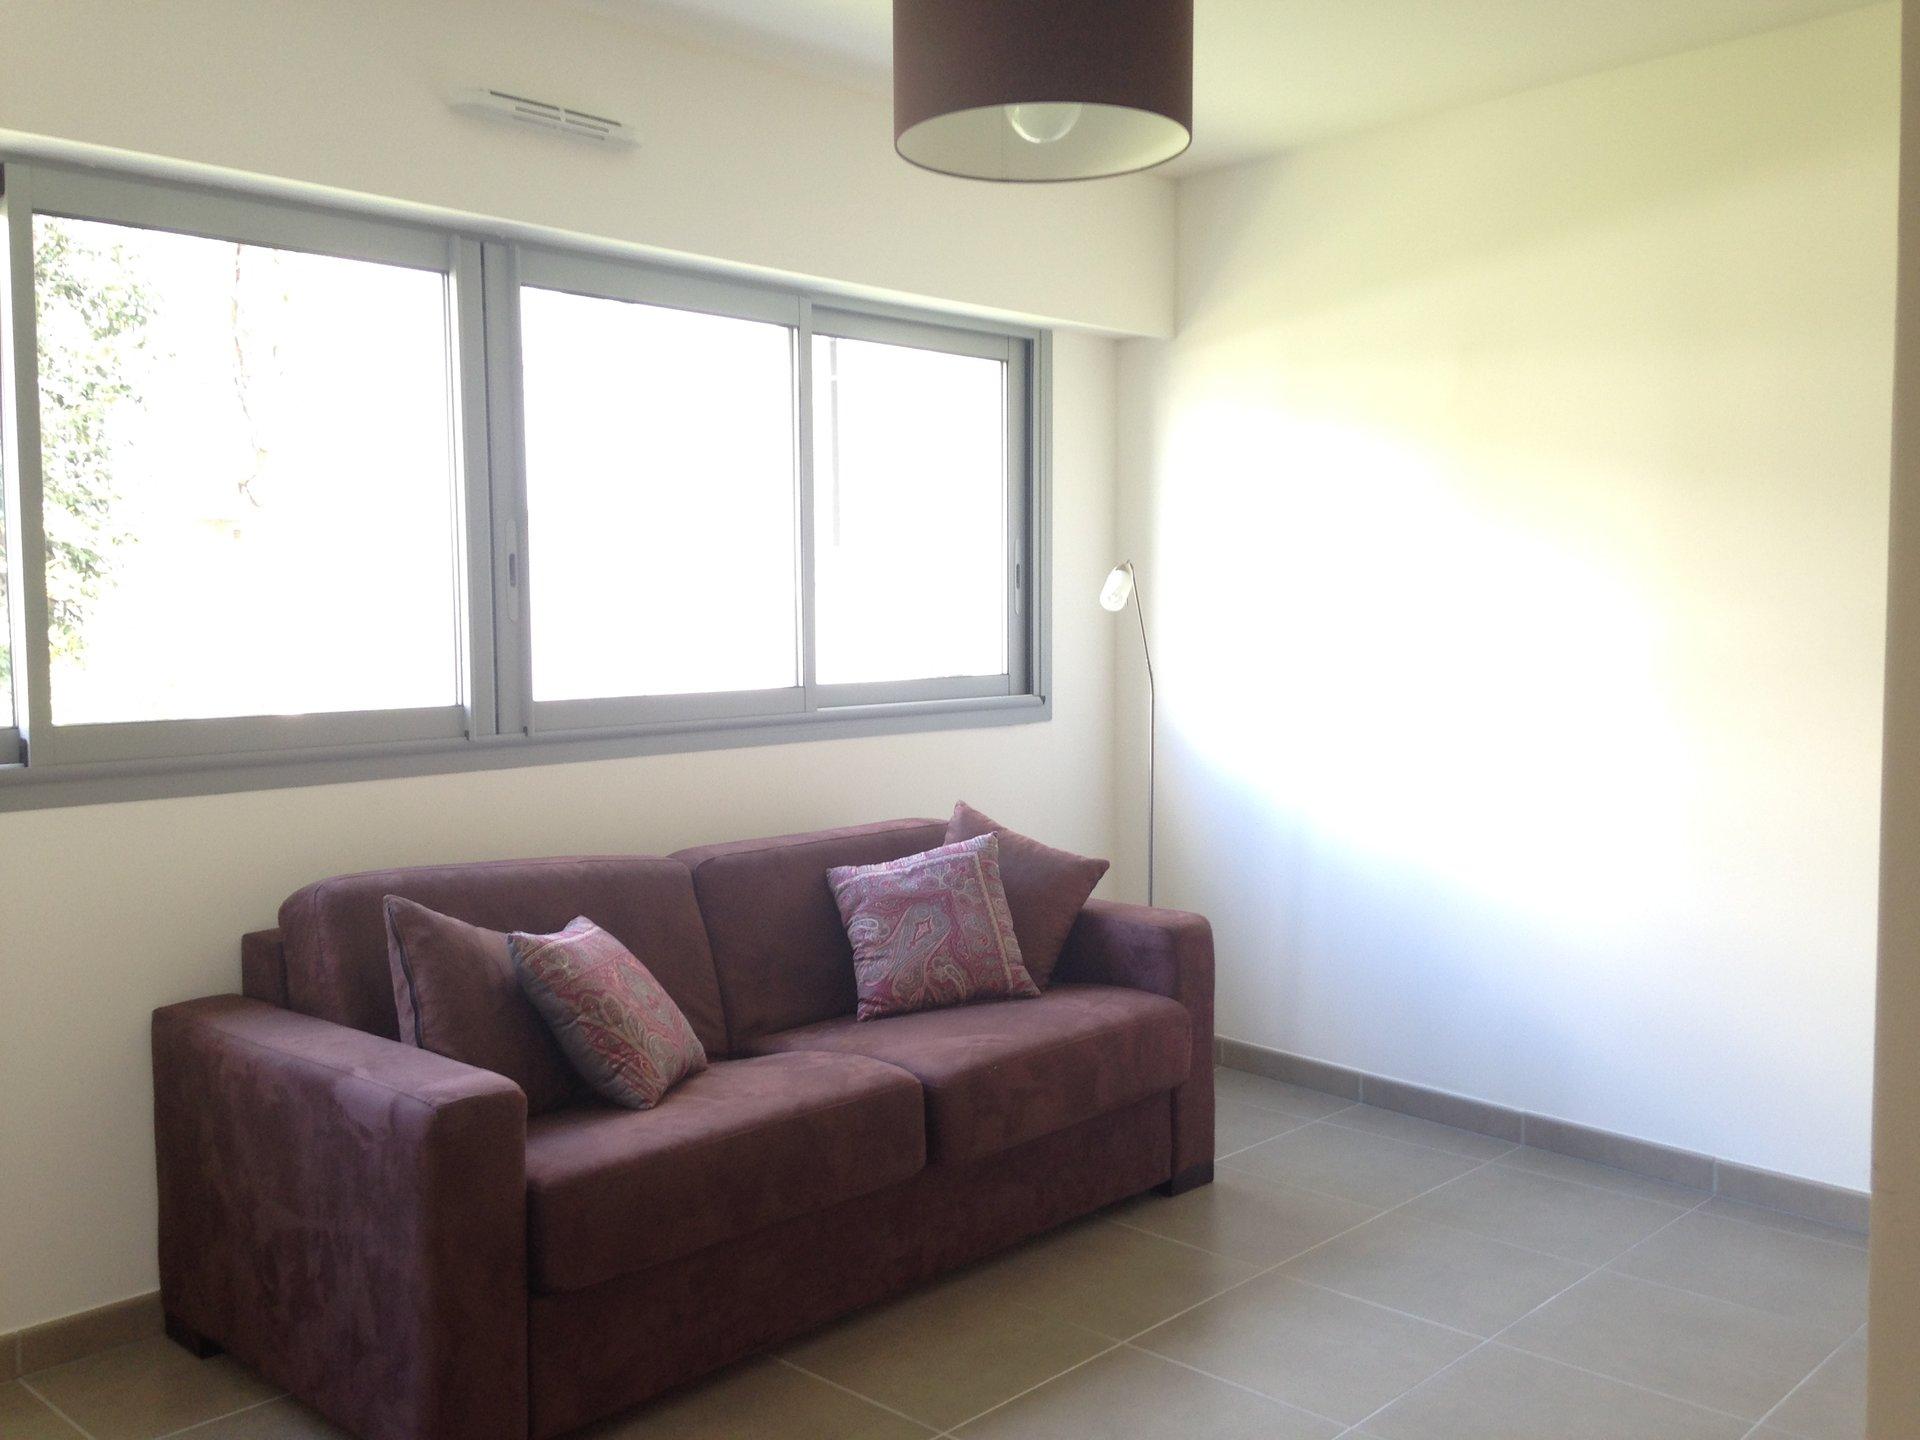 3 pieces meublé, residence recente de standing, centre-ville au calme